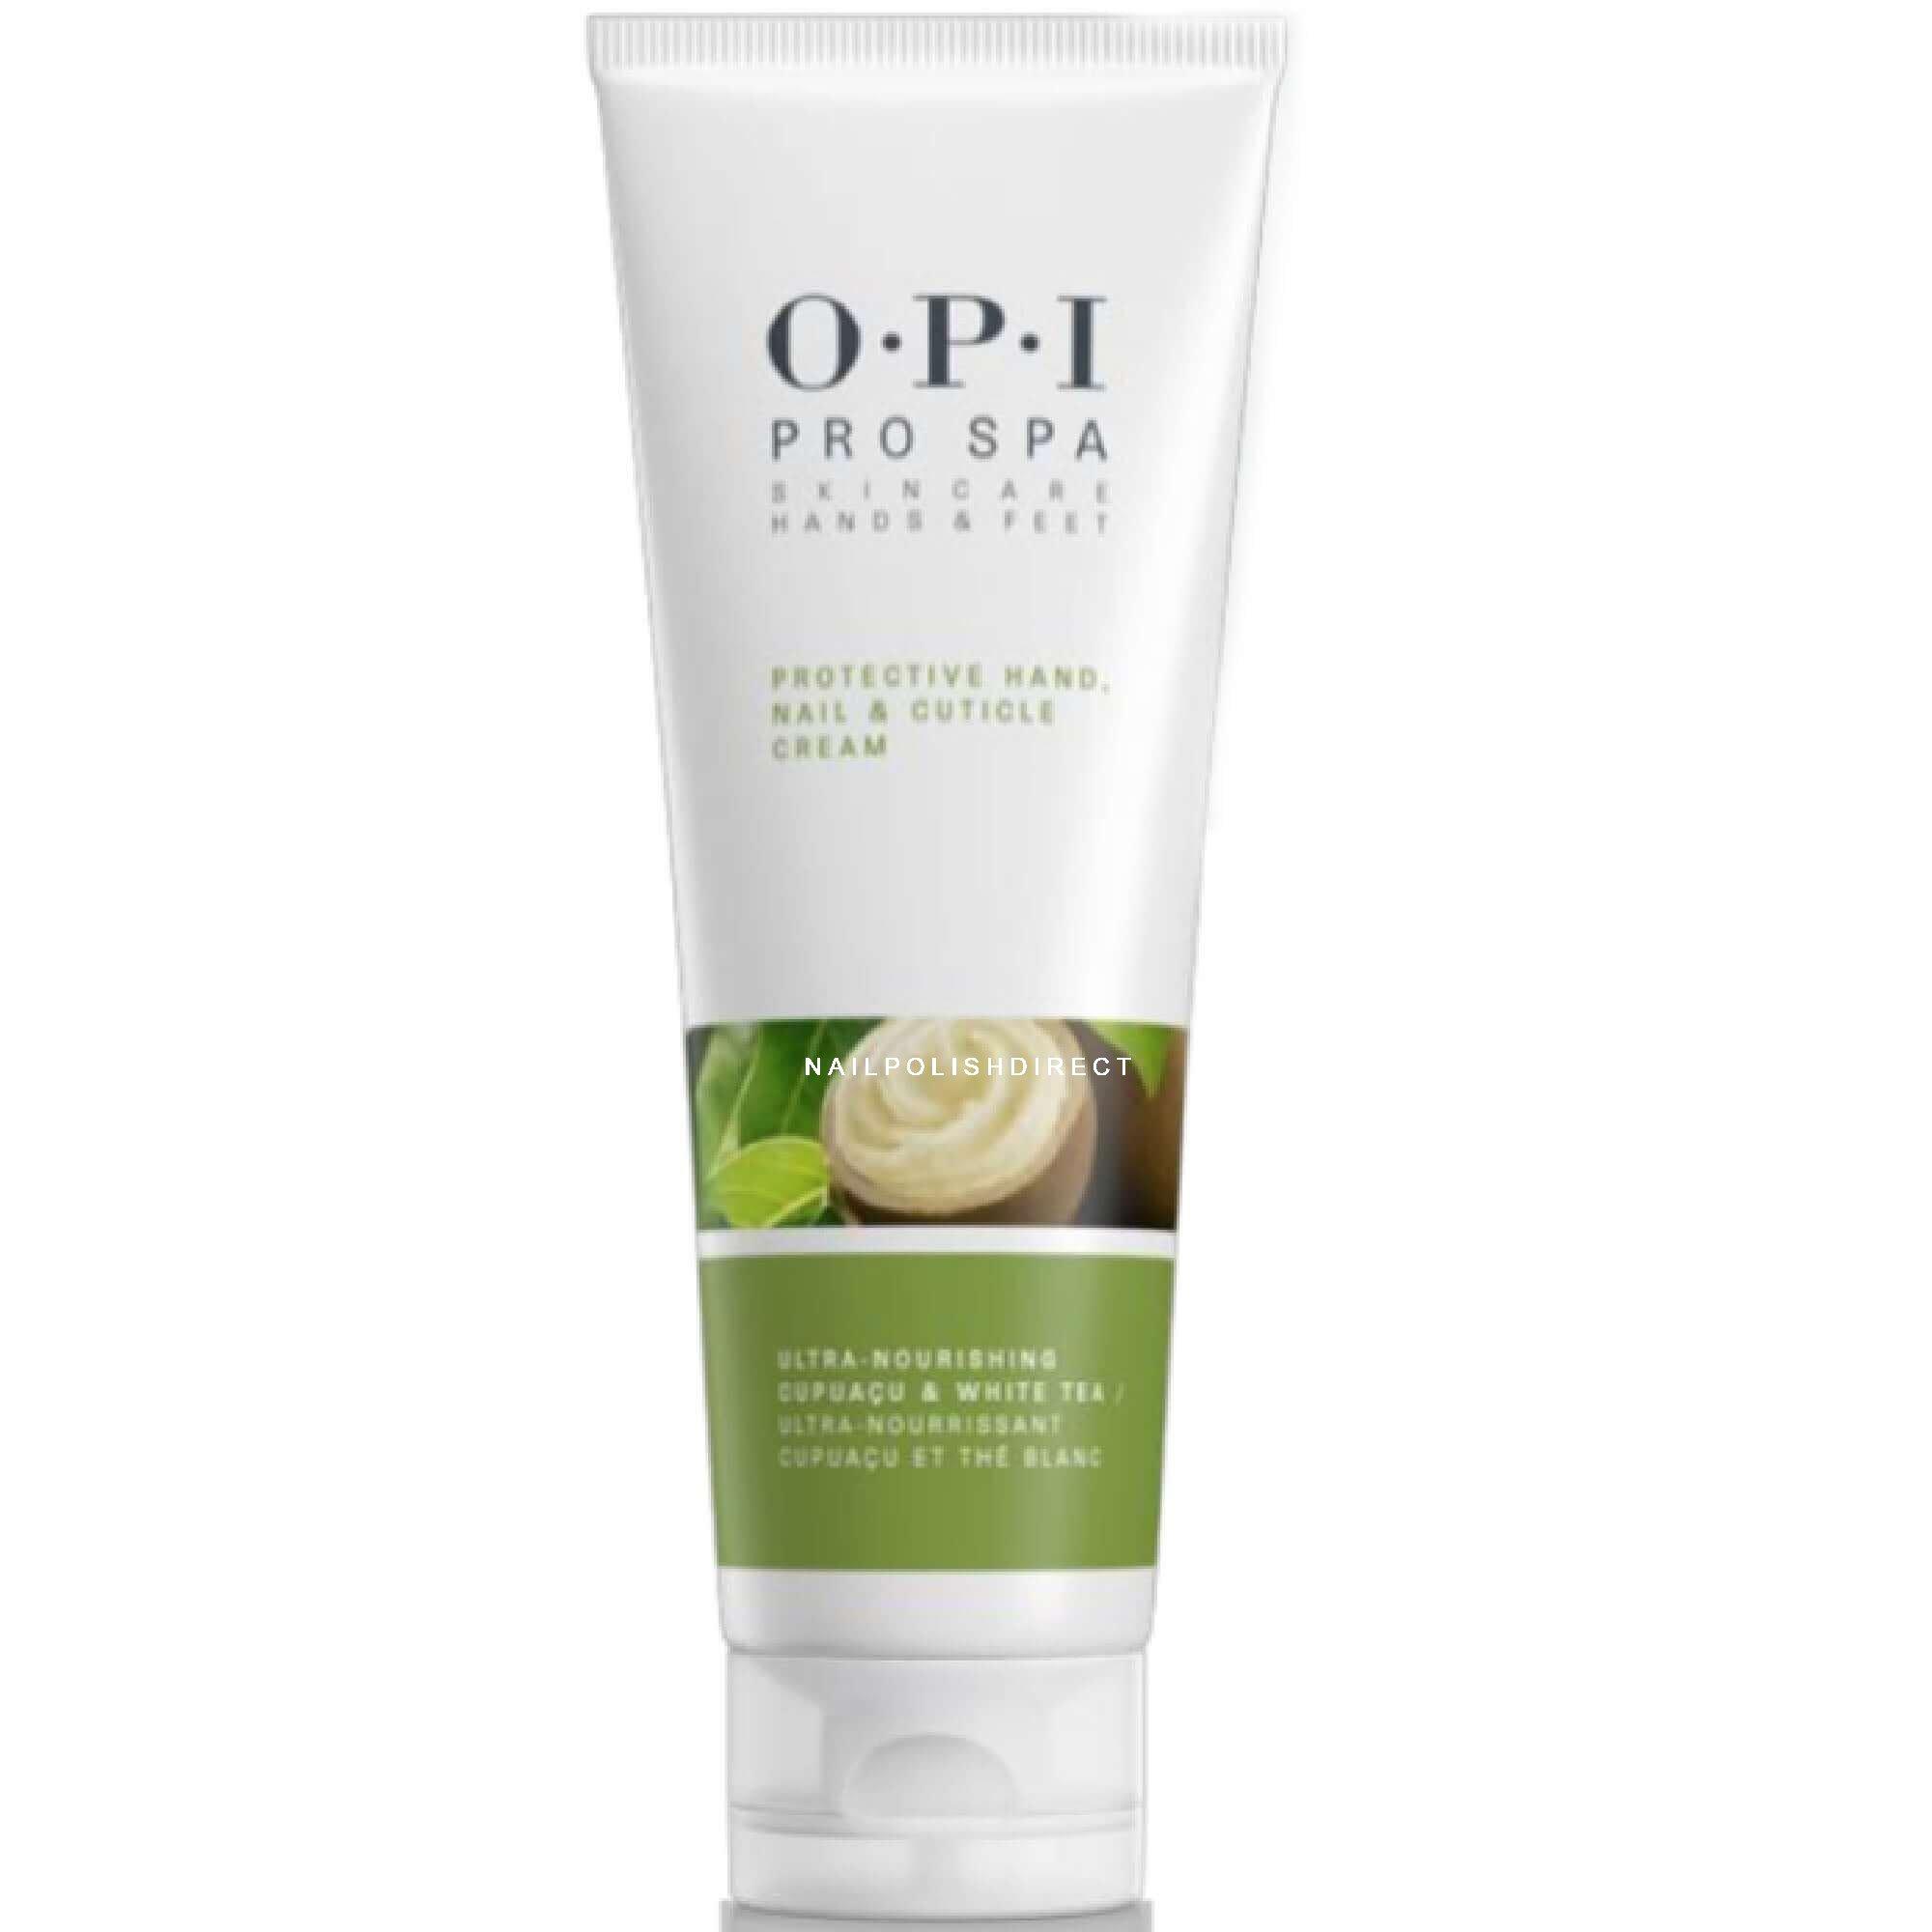 OPI Pro Spa - Protective Hand, Nail & Cuticle Cream 50ml